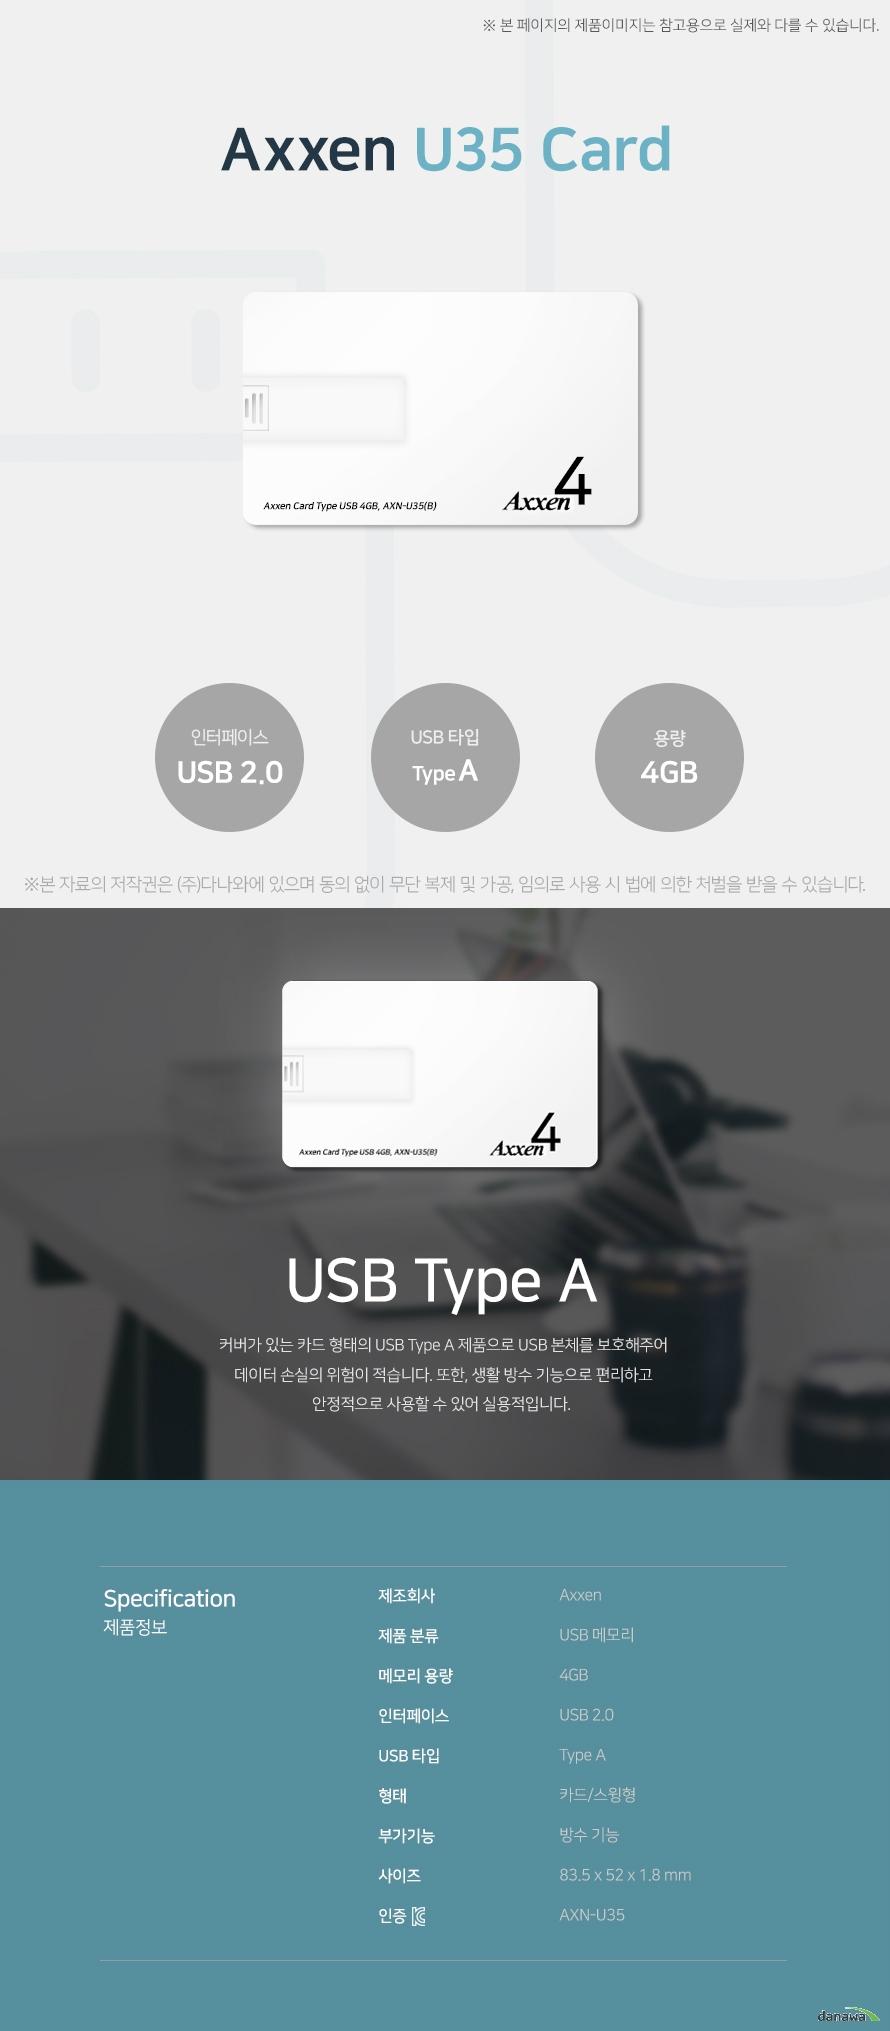 Axxen U35 Card 4GB USB Type A 커버가 있는 카드 형태의 USB Type A 제품으로 USB 본체를 보호해주어 데이터 손실의 의험이 적습니다. 또한, 생활 방수 기능으로 편리하고 안정적으로 사용할 수 있어 실용적입니다. 스펙 제조회사 AXXEN 제품 분류 USB 메모리 메모리 용량 4GB 인터페이스 USB 2.0 USB 타입 Type A 형태 카드/스윙형 부가기능 방수 기능 사이즈 83.5x52x1.8mm KC인증 AXN-U35